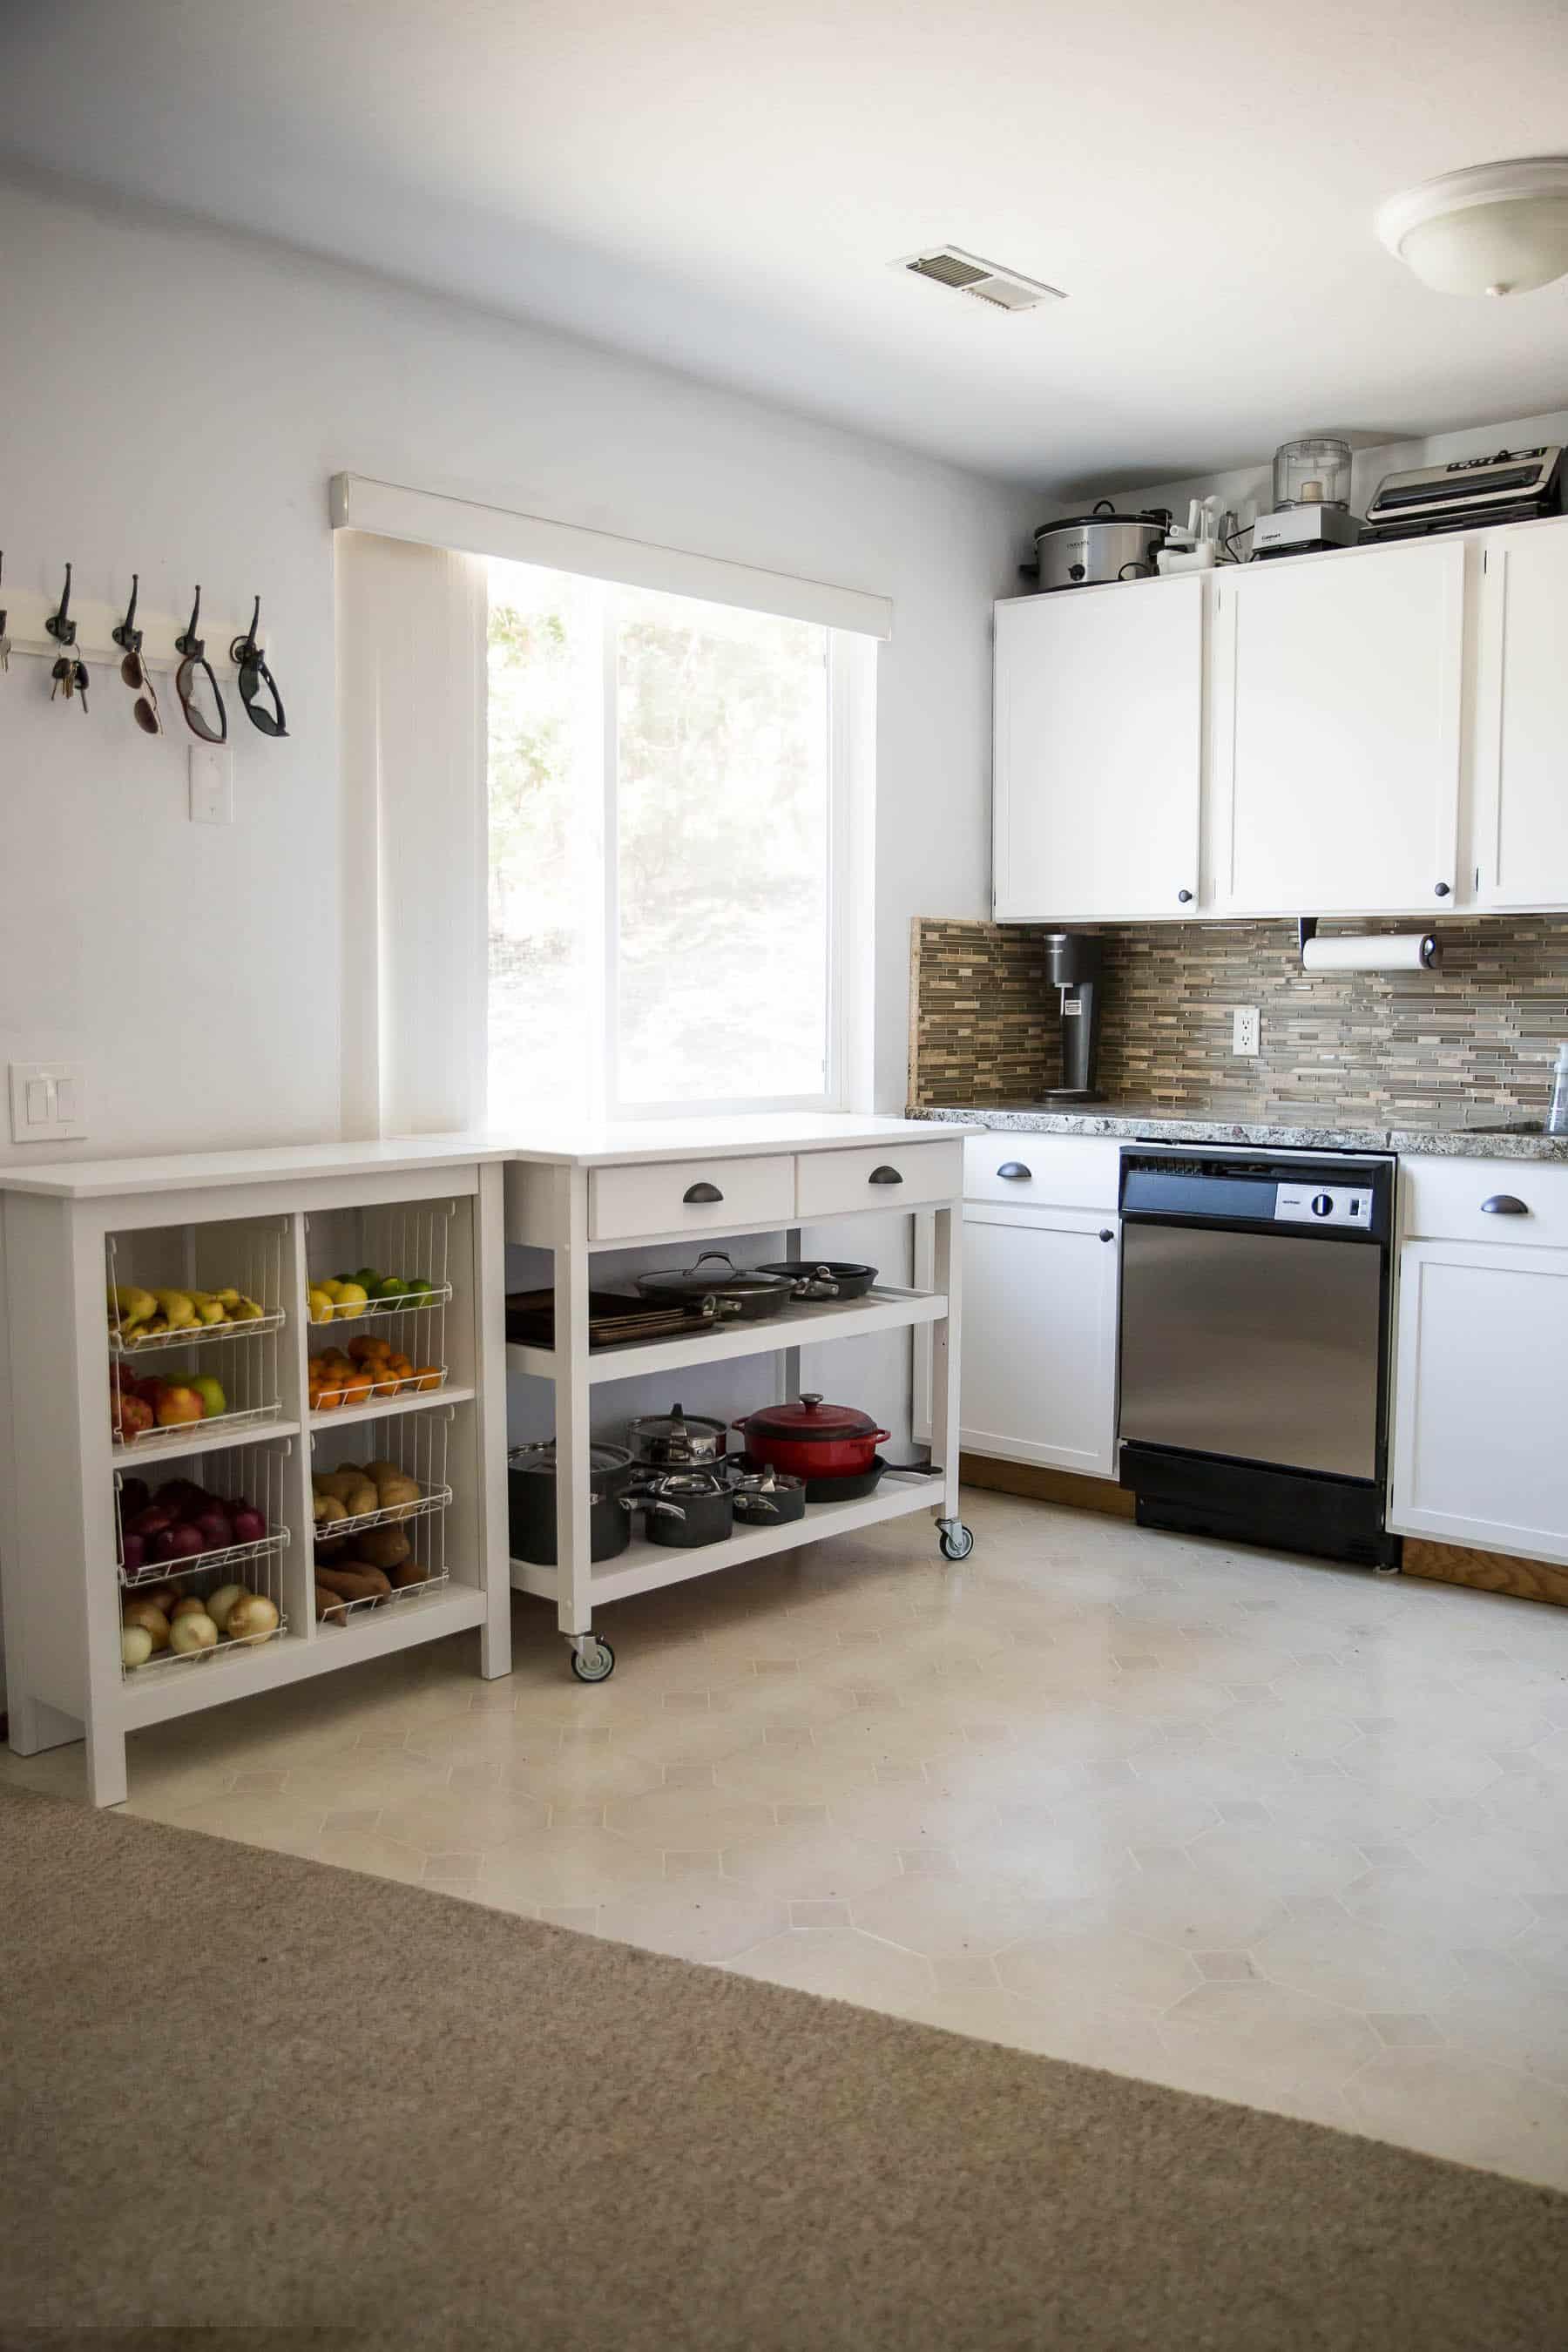 Our $281 Kitchen Remodel - Tastes Lovely